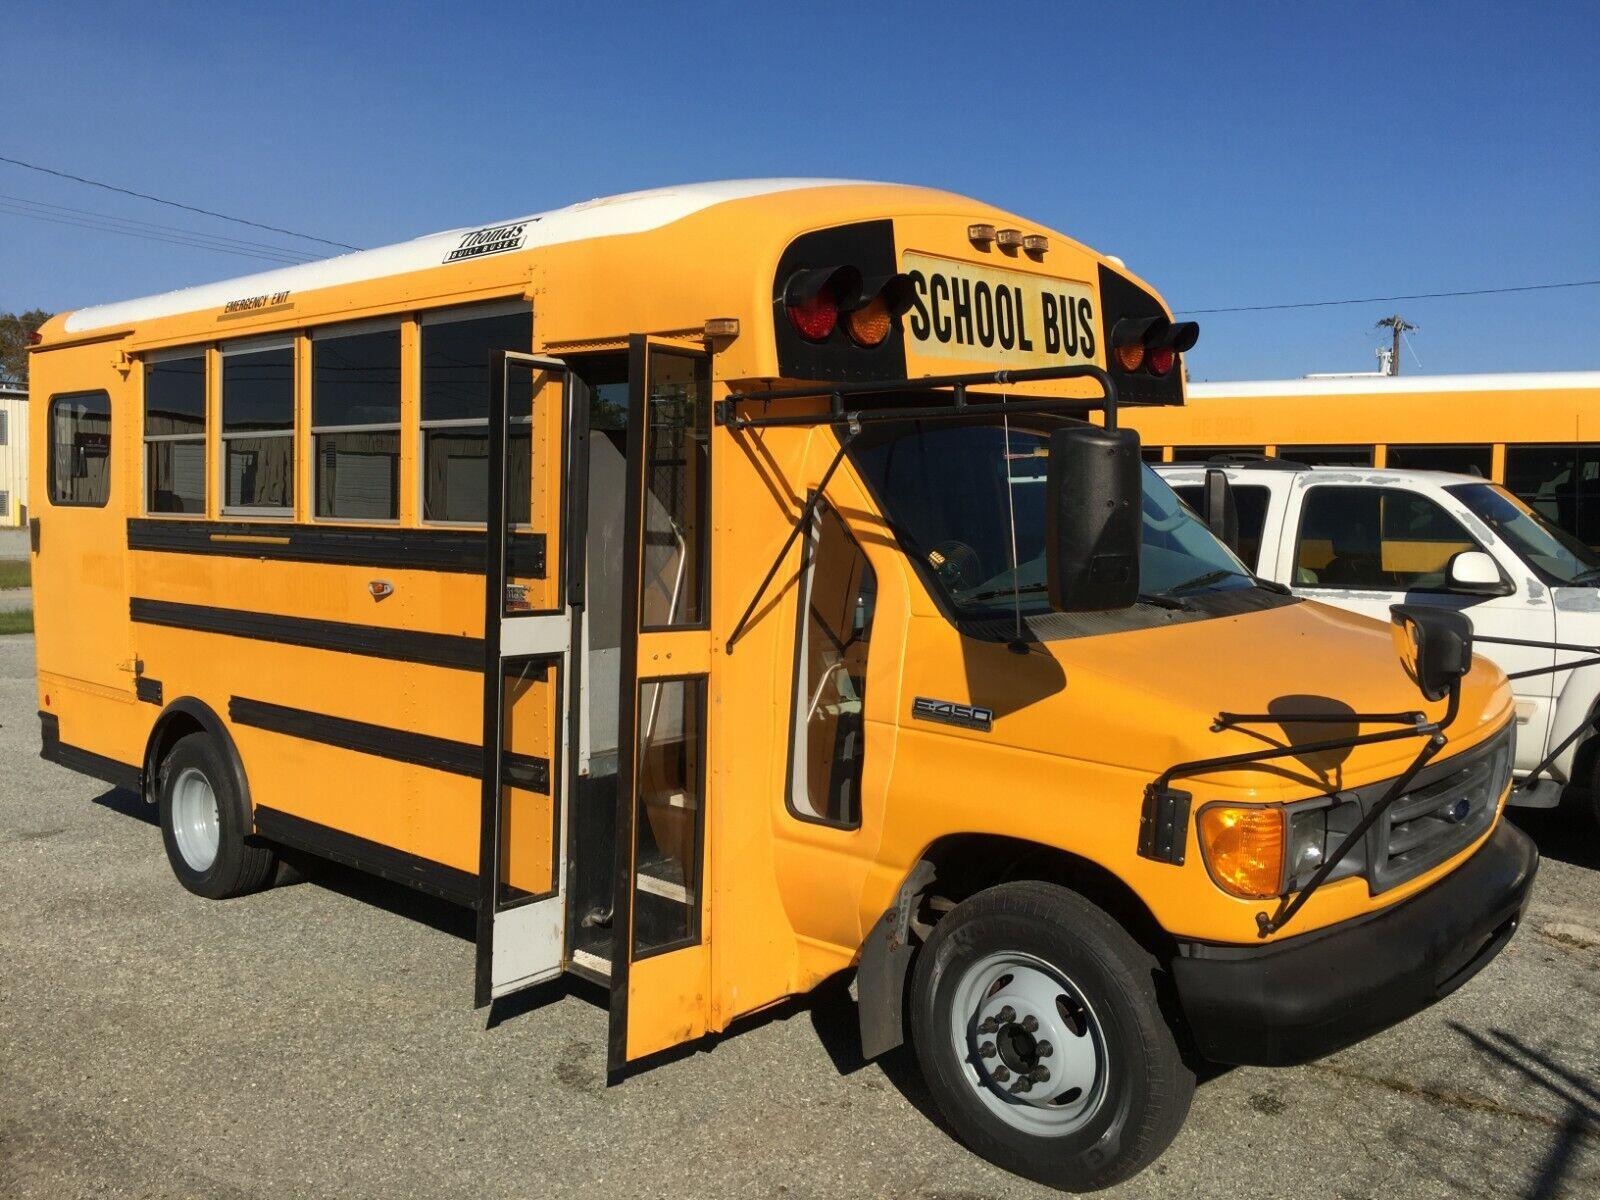 2006 FORD E450 MOBILITY SCHOOL BUS TRUCK VAN RV CAMPER